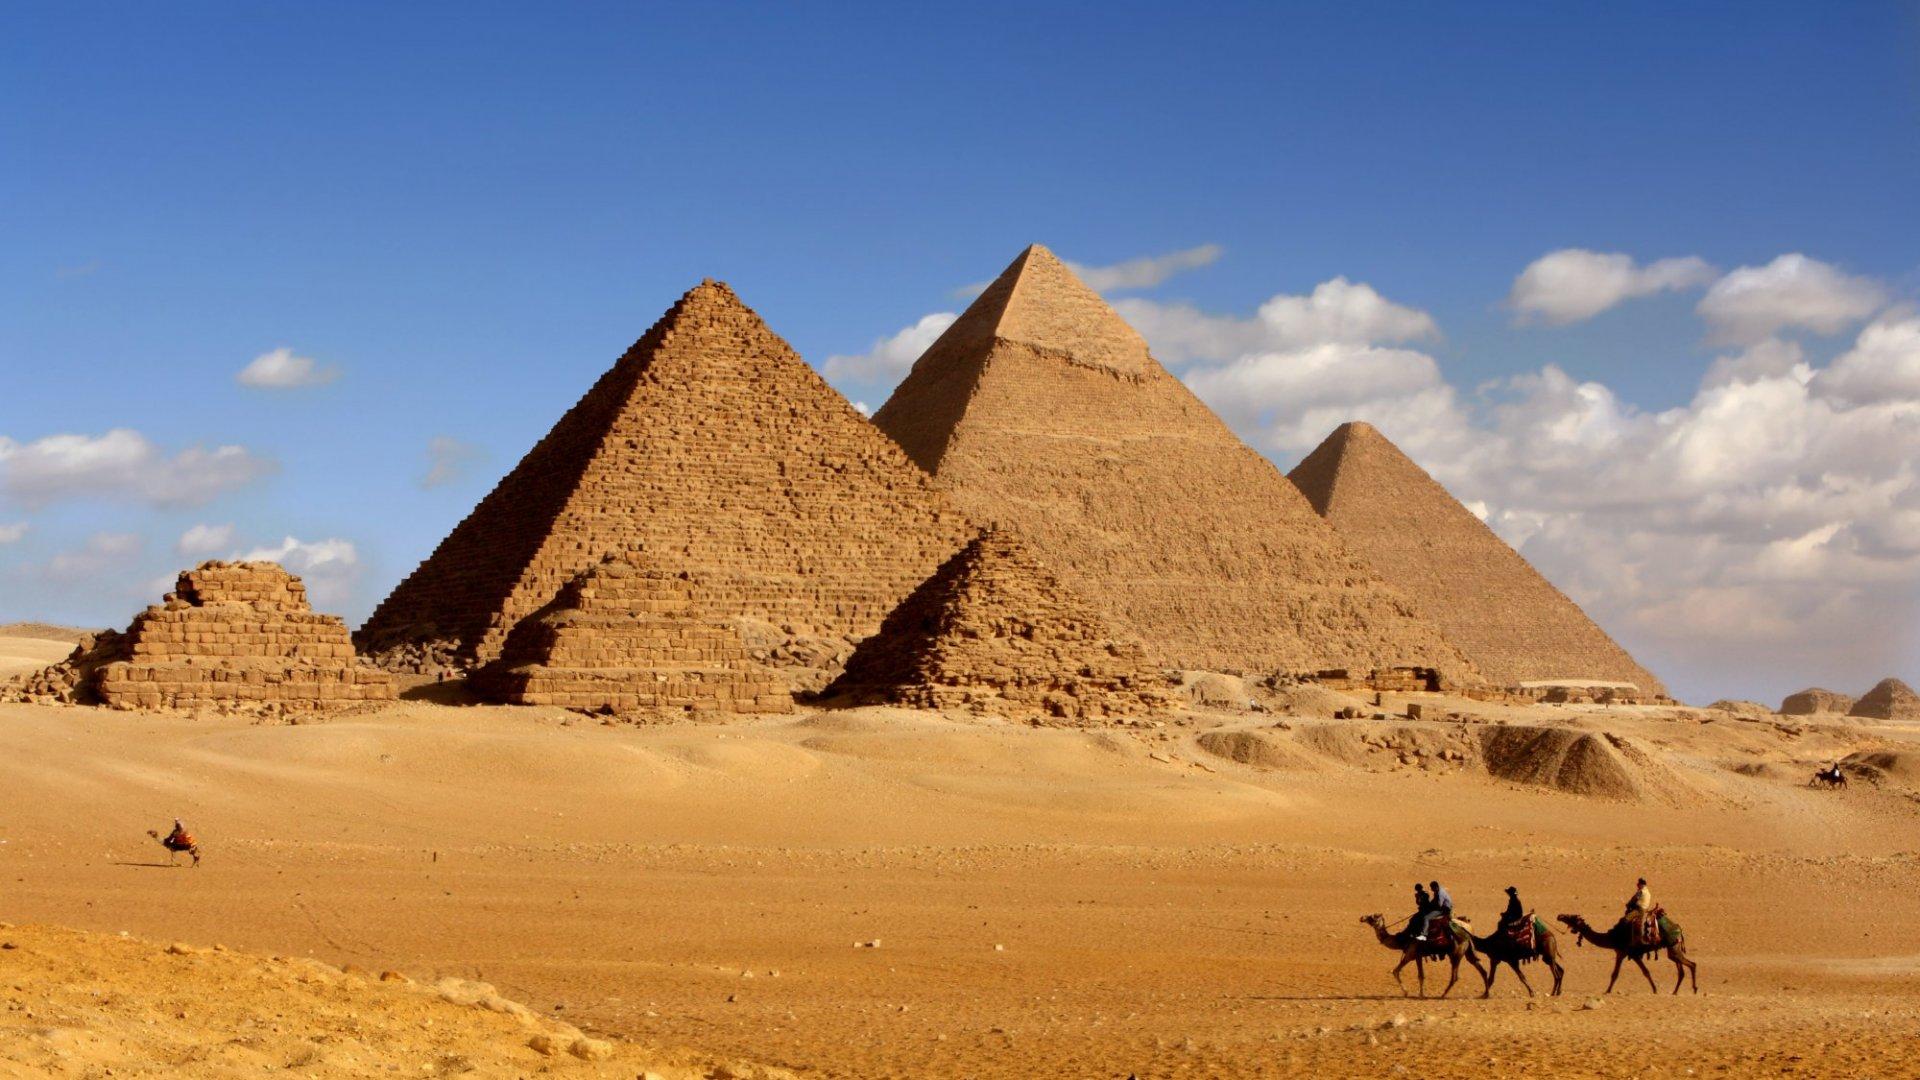 Best Kept Travel Secrets: Paul's Pyramid Tips